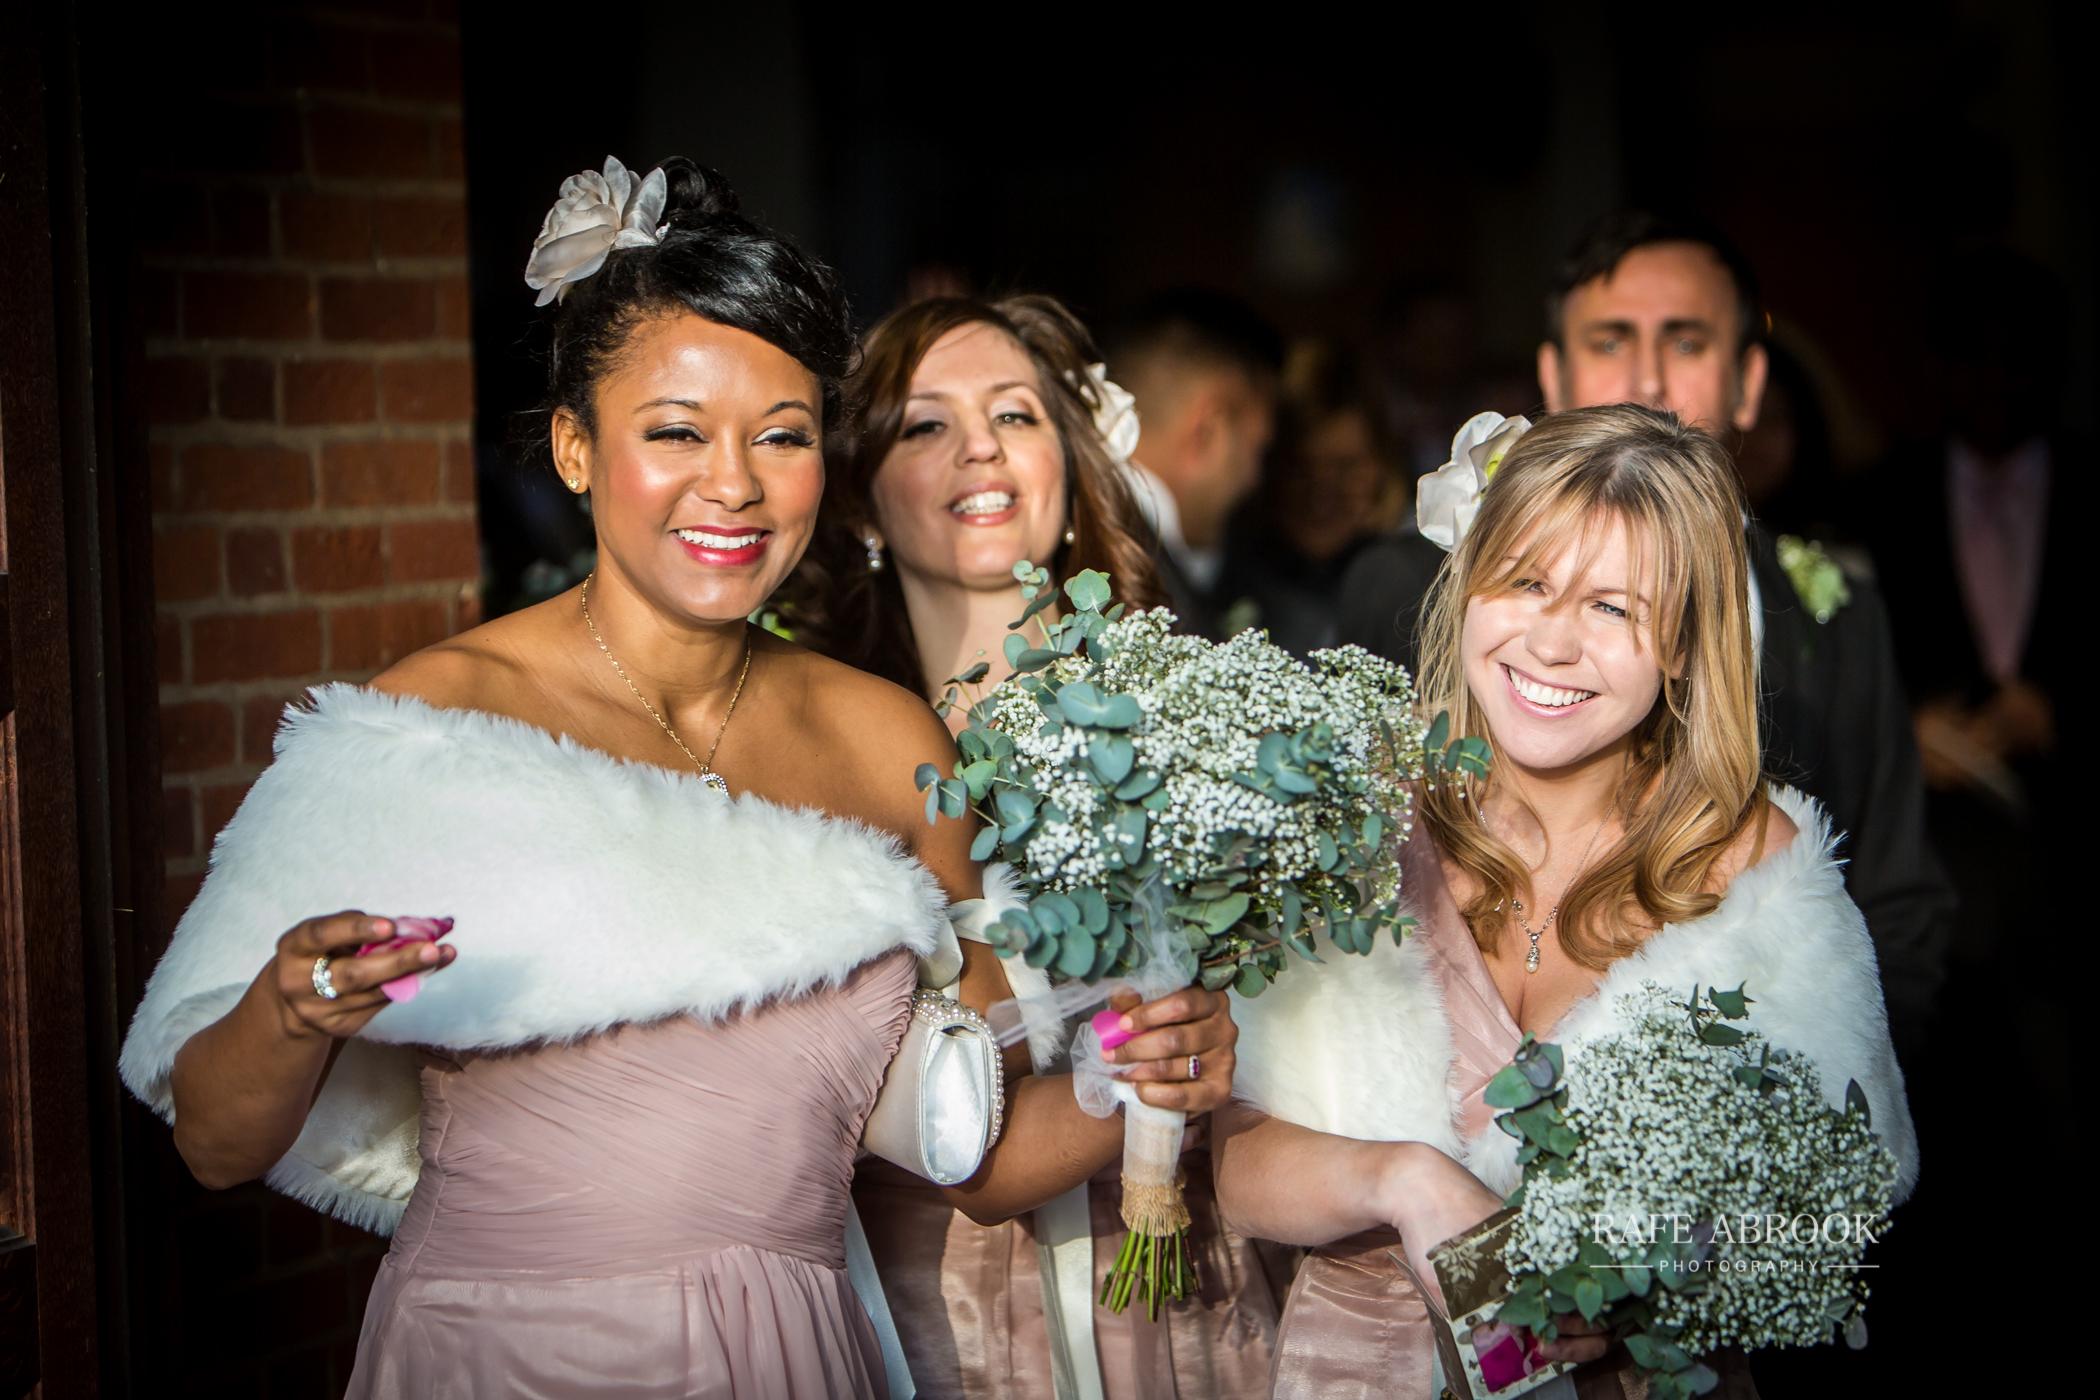 roma & pete wedding hampstead shenley hertfordshire -250.jpg